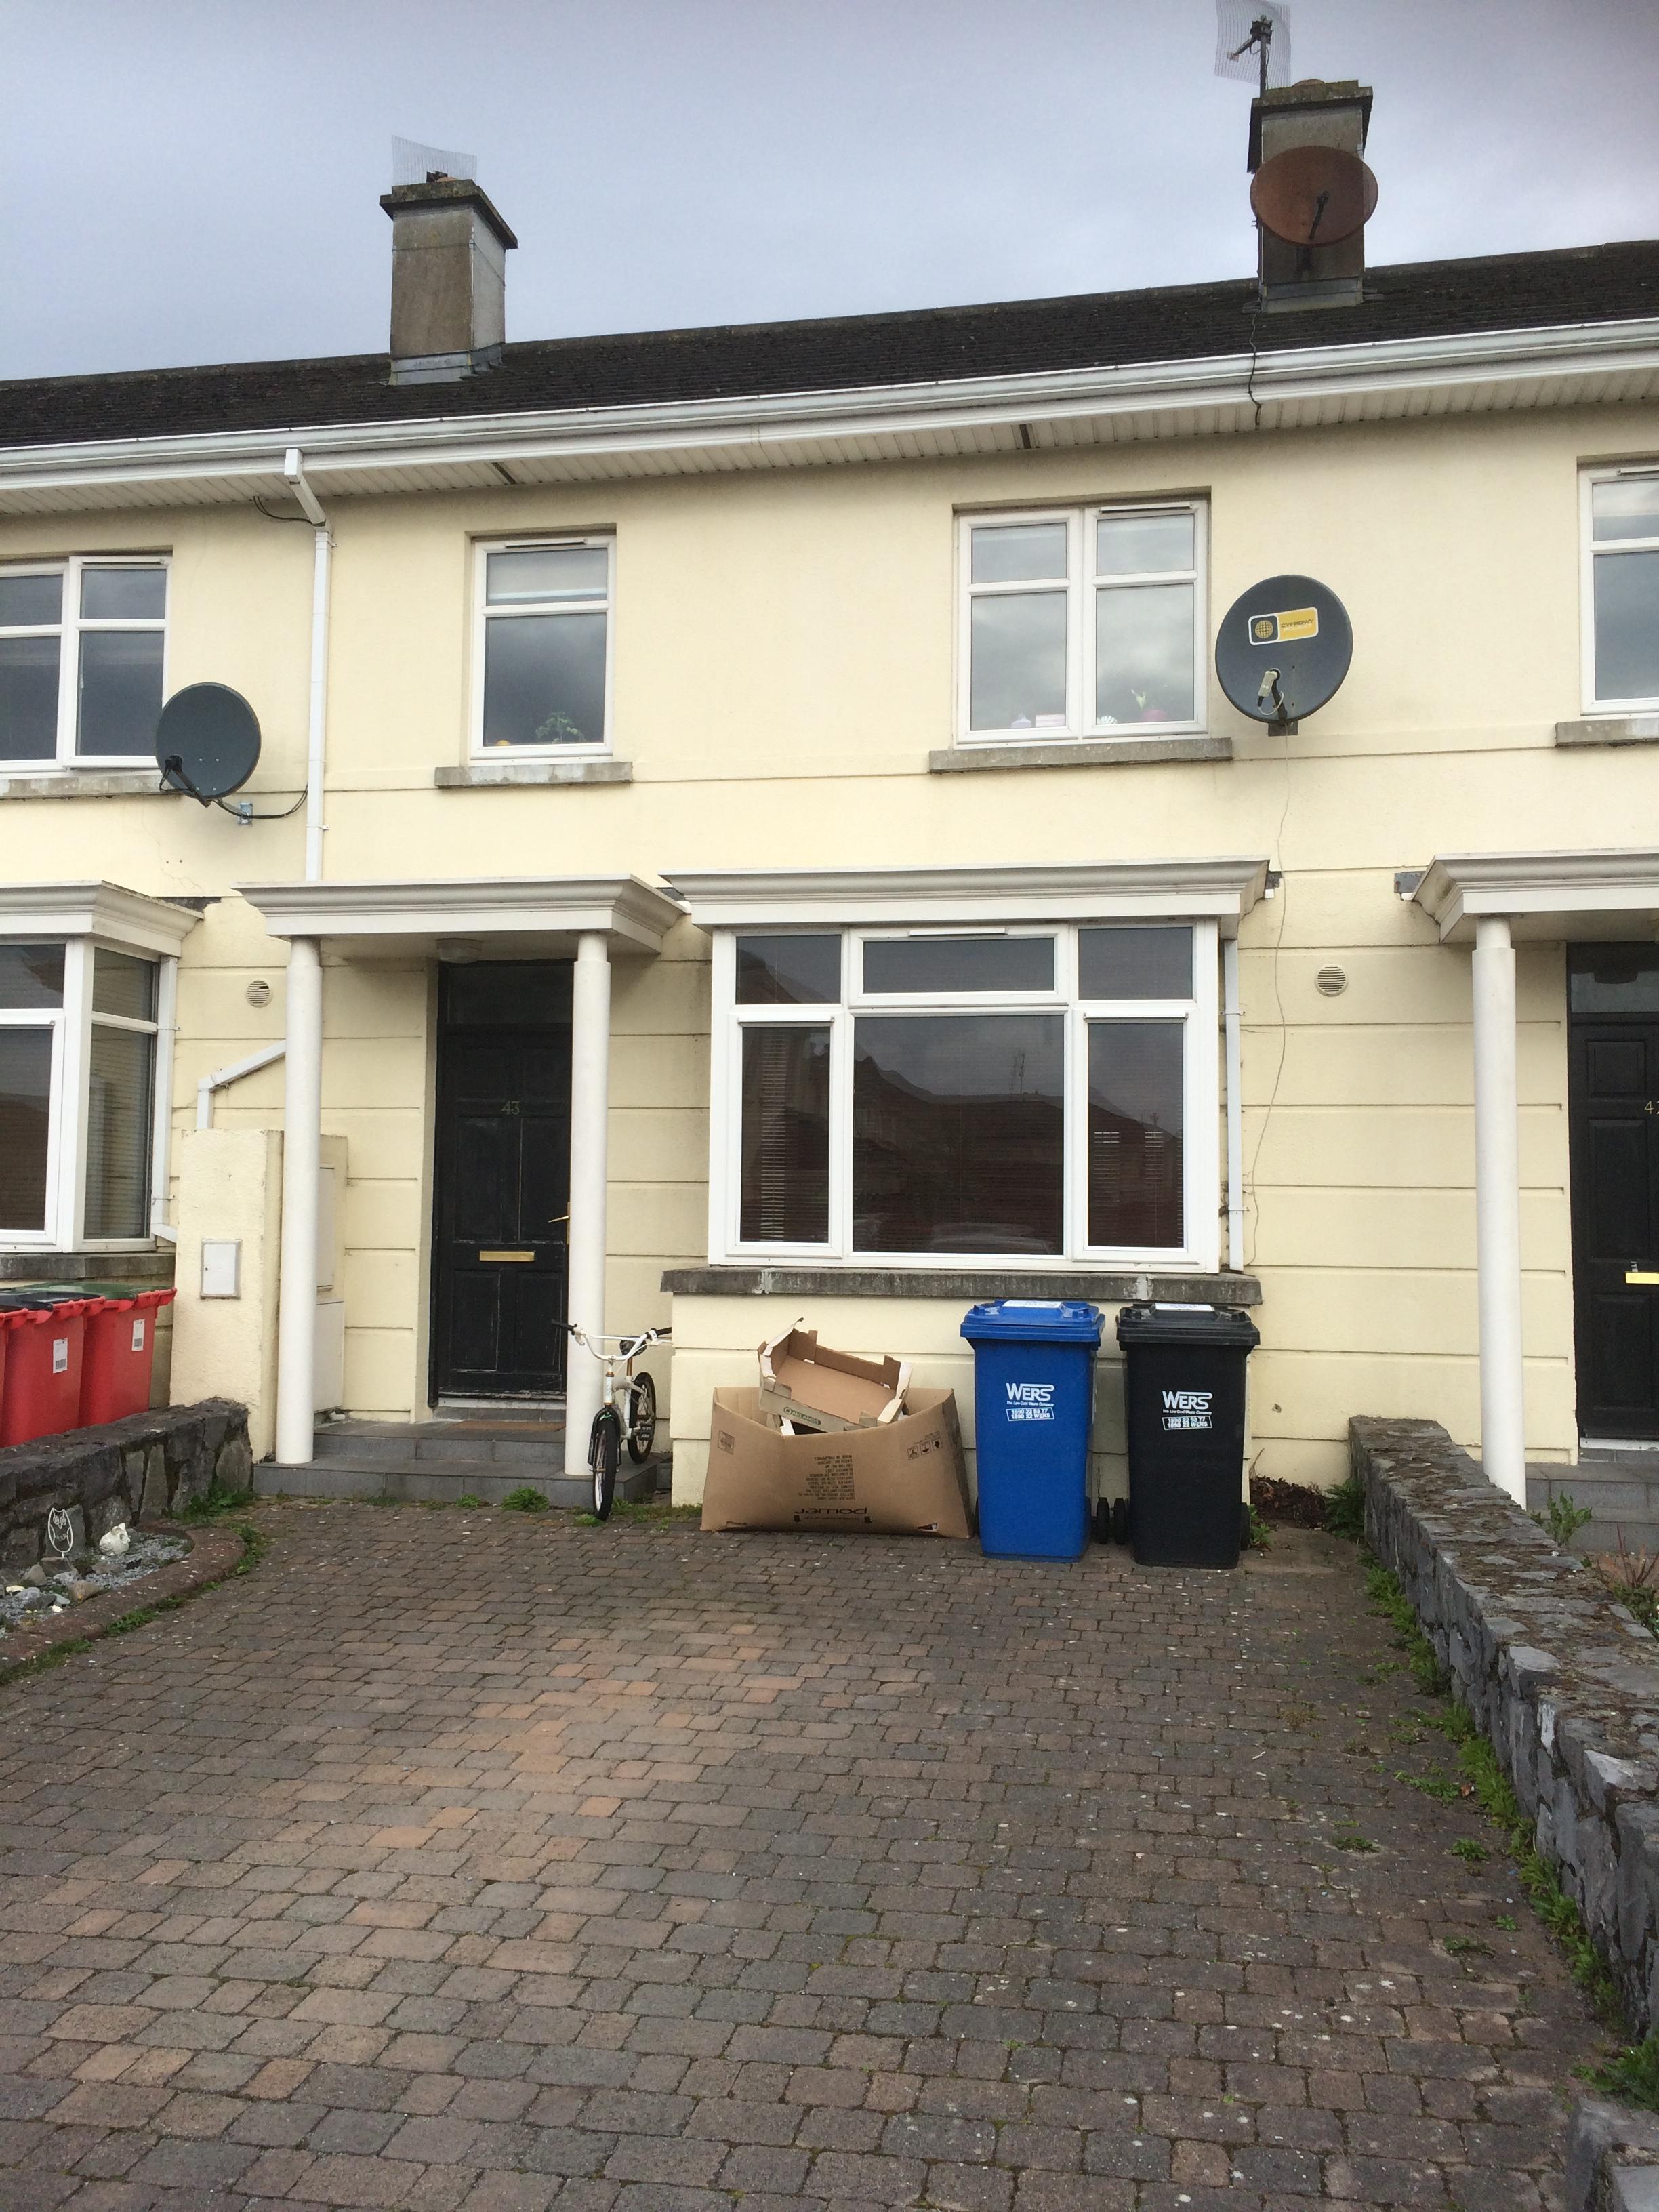 43 Orangrove, Oranhill, Oranmore, Co. Galway